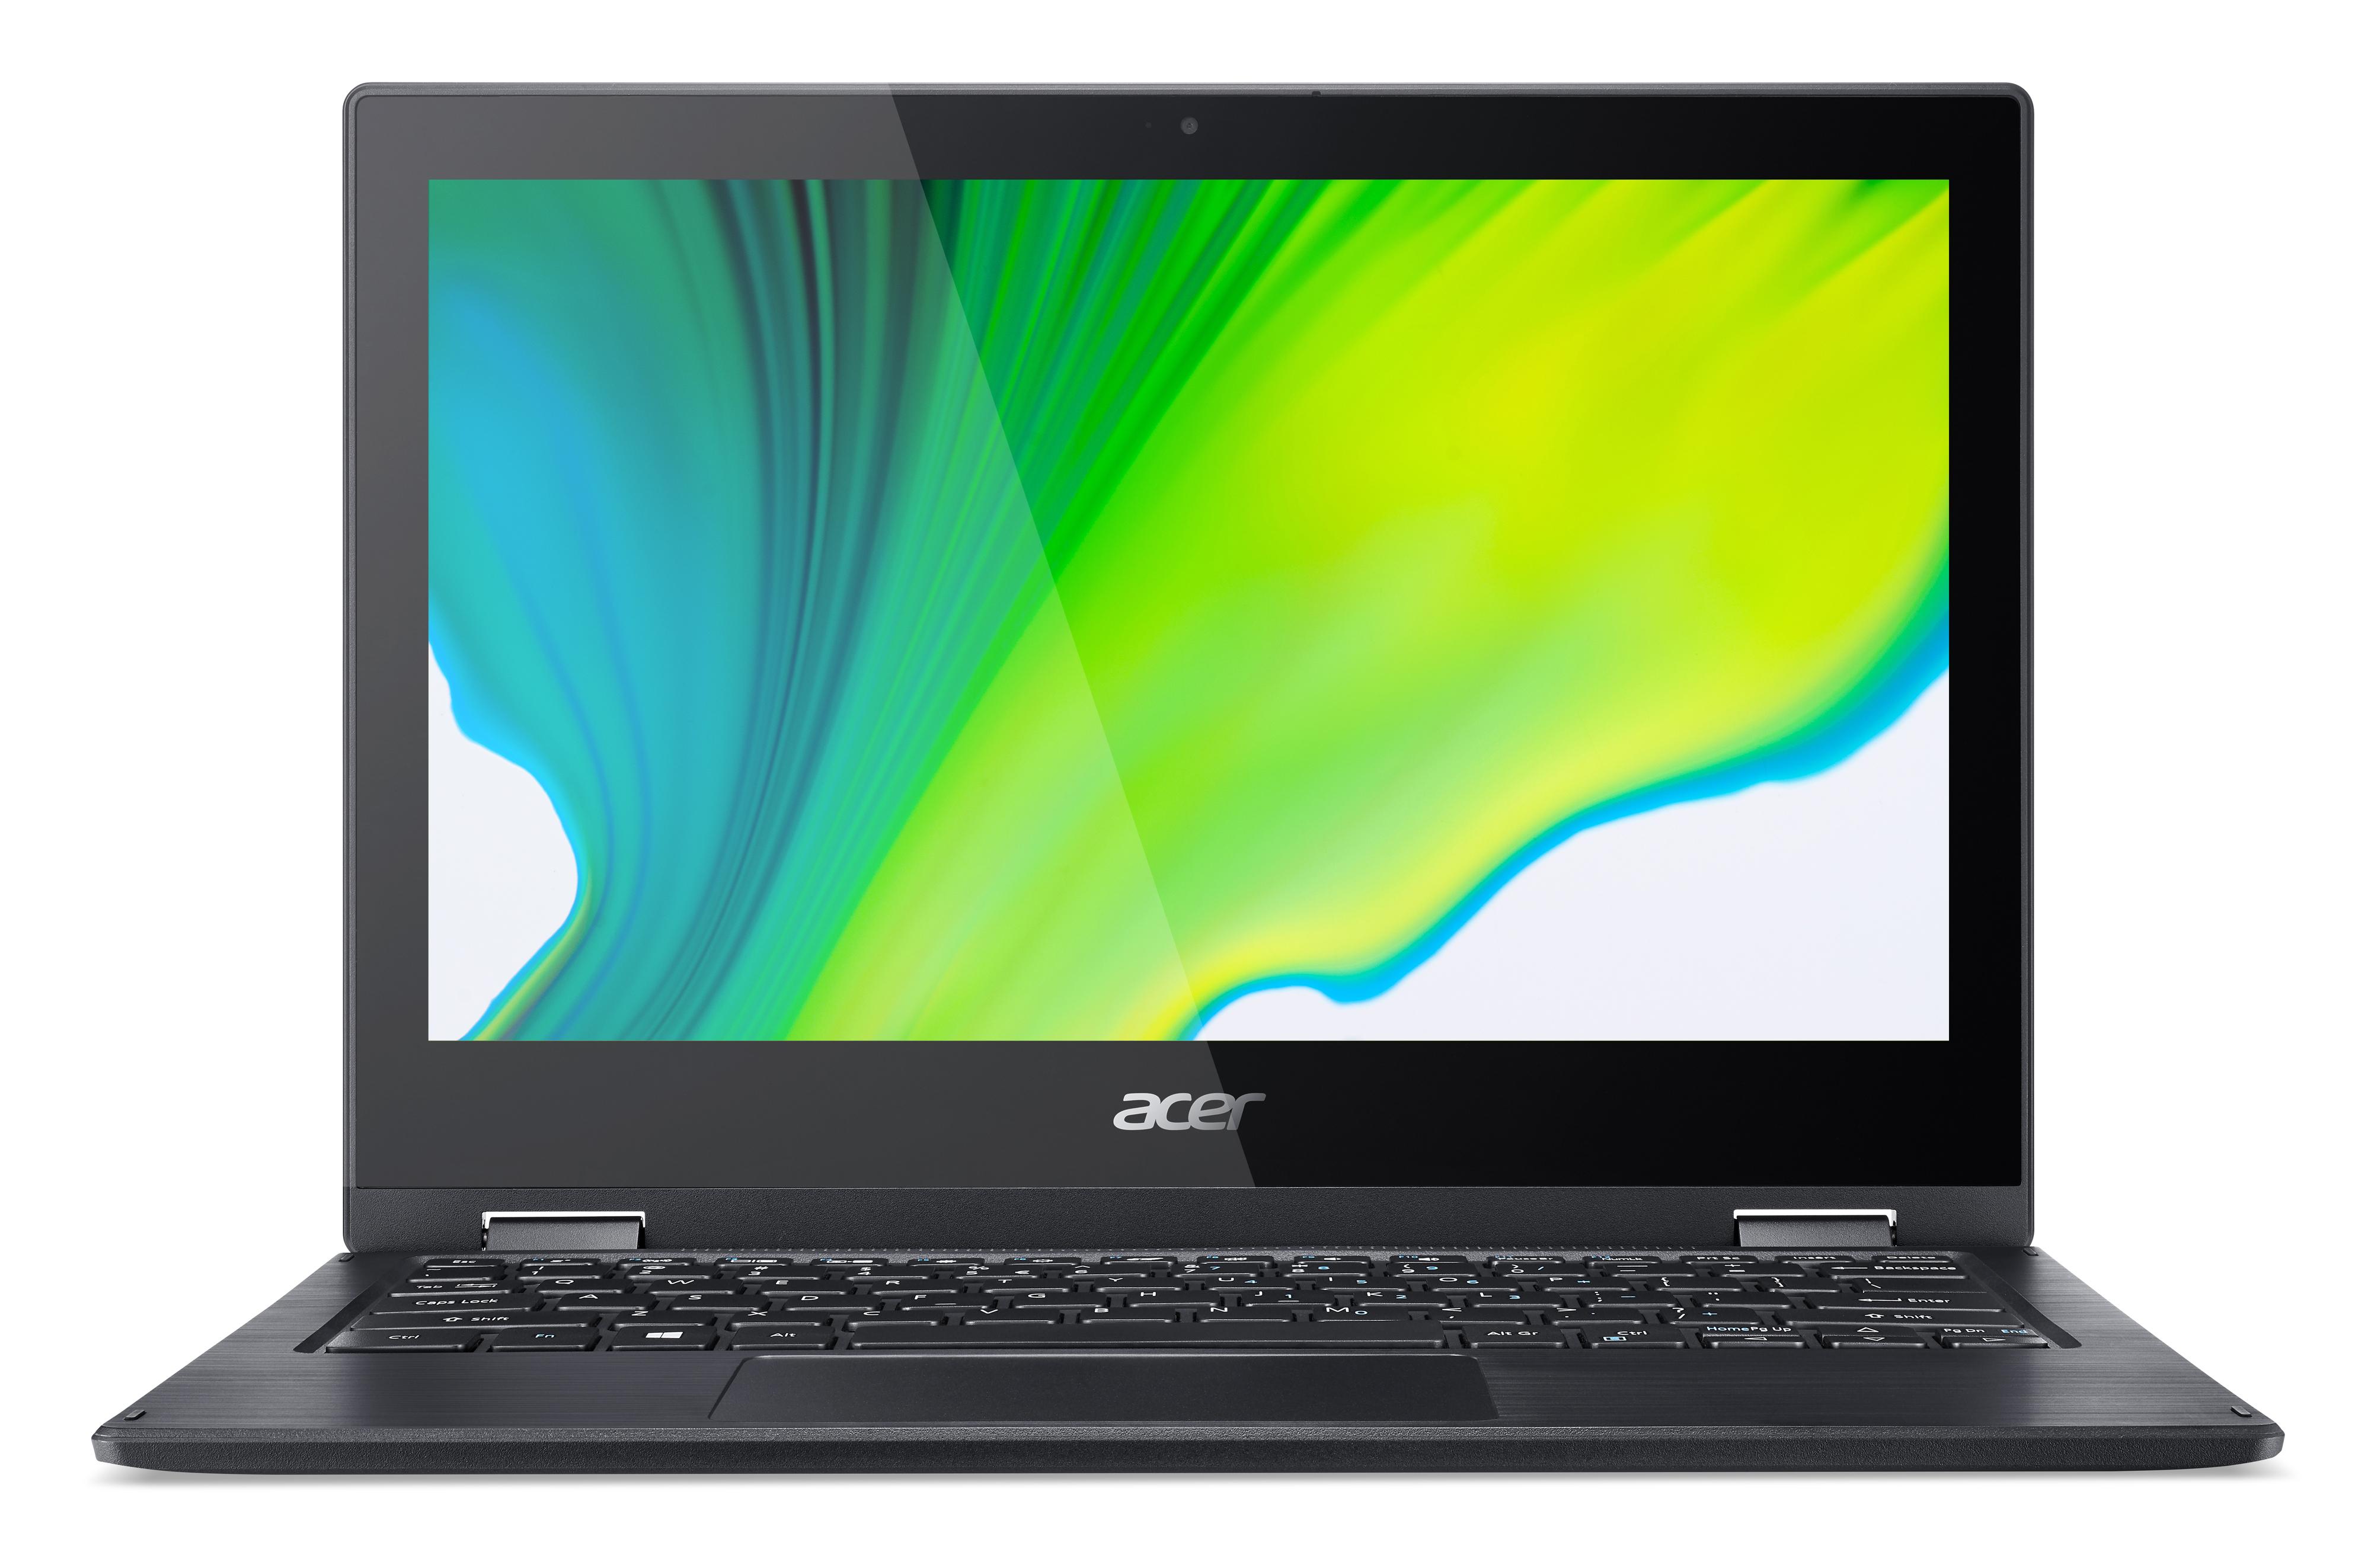 Acer Spin 1 SP111-33-P084 Ibrido (2 in 1) 29,5 cm (11.6